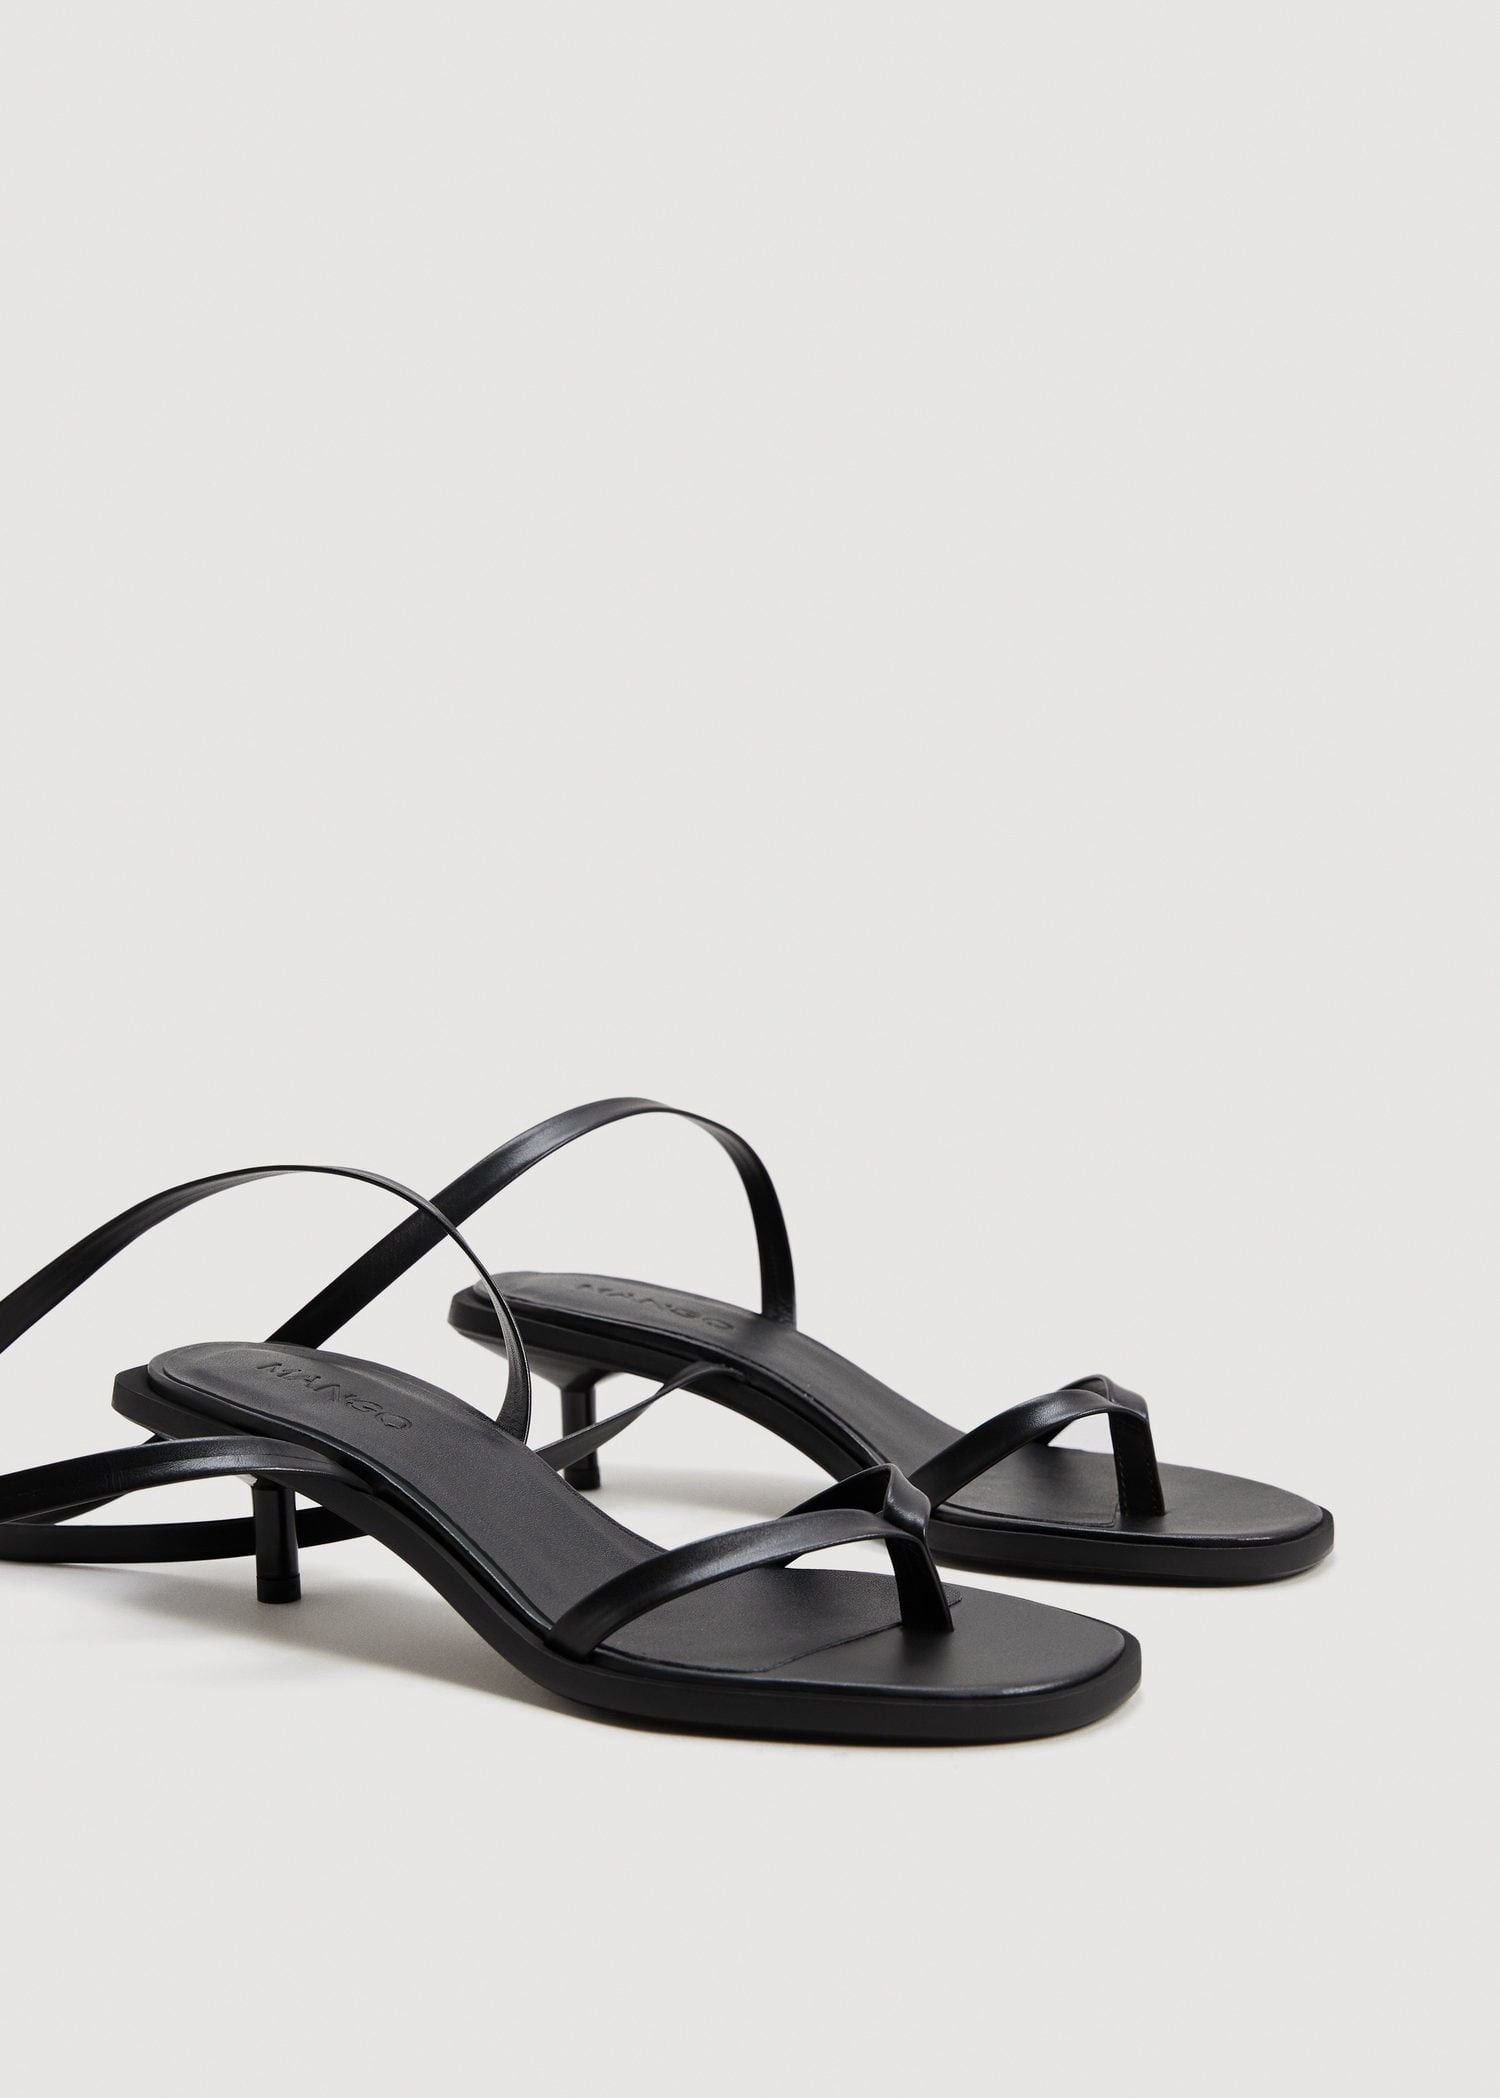 aa9c632d196 Mango Leather Straps Sandals - Women